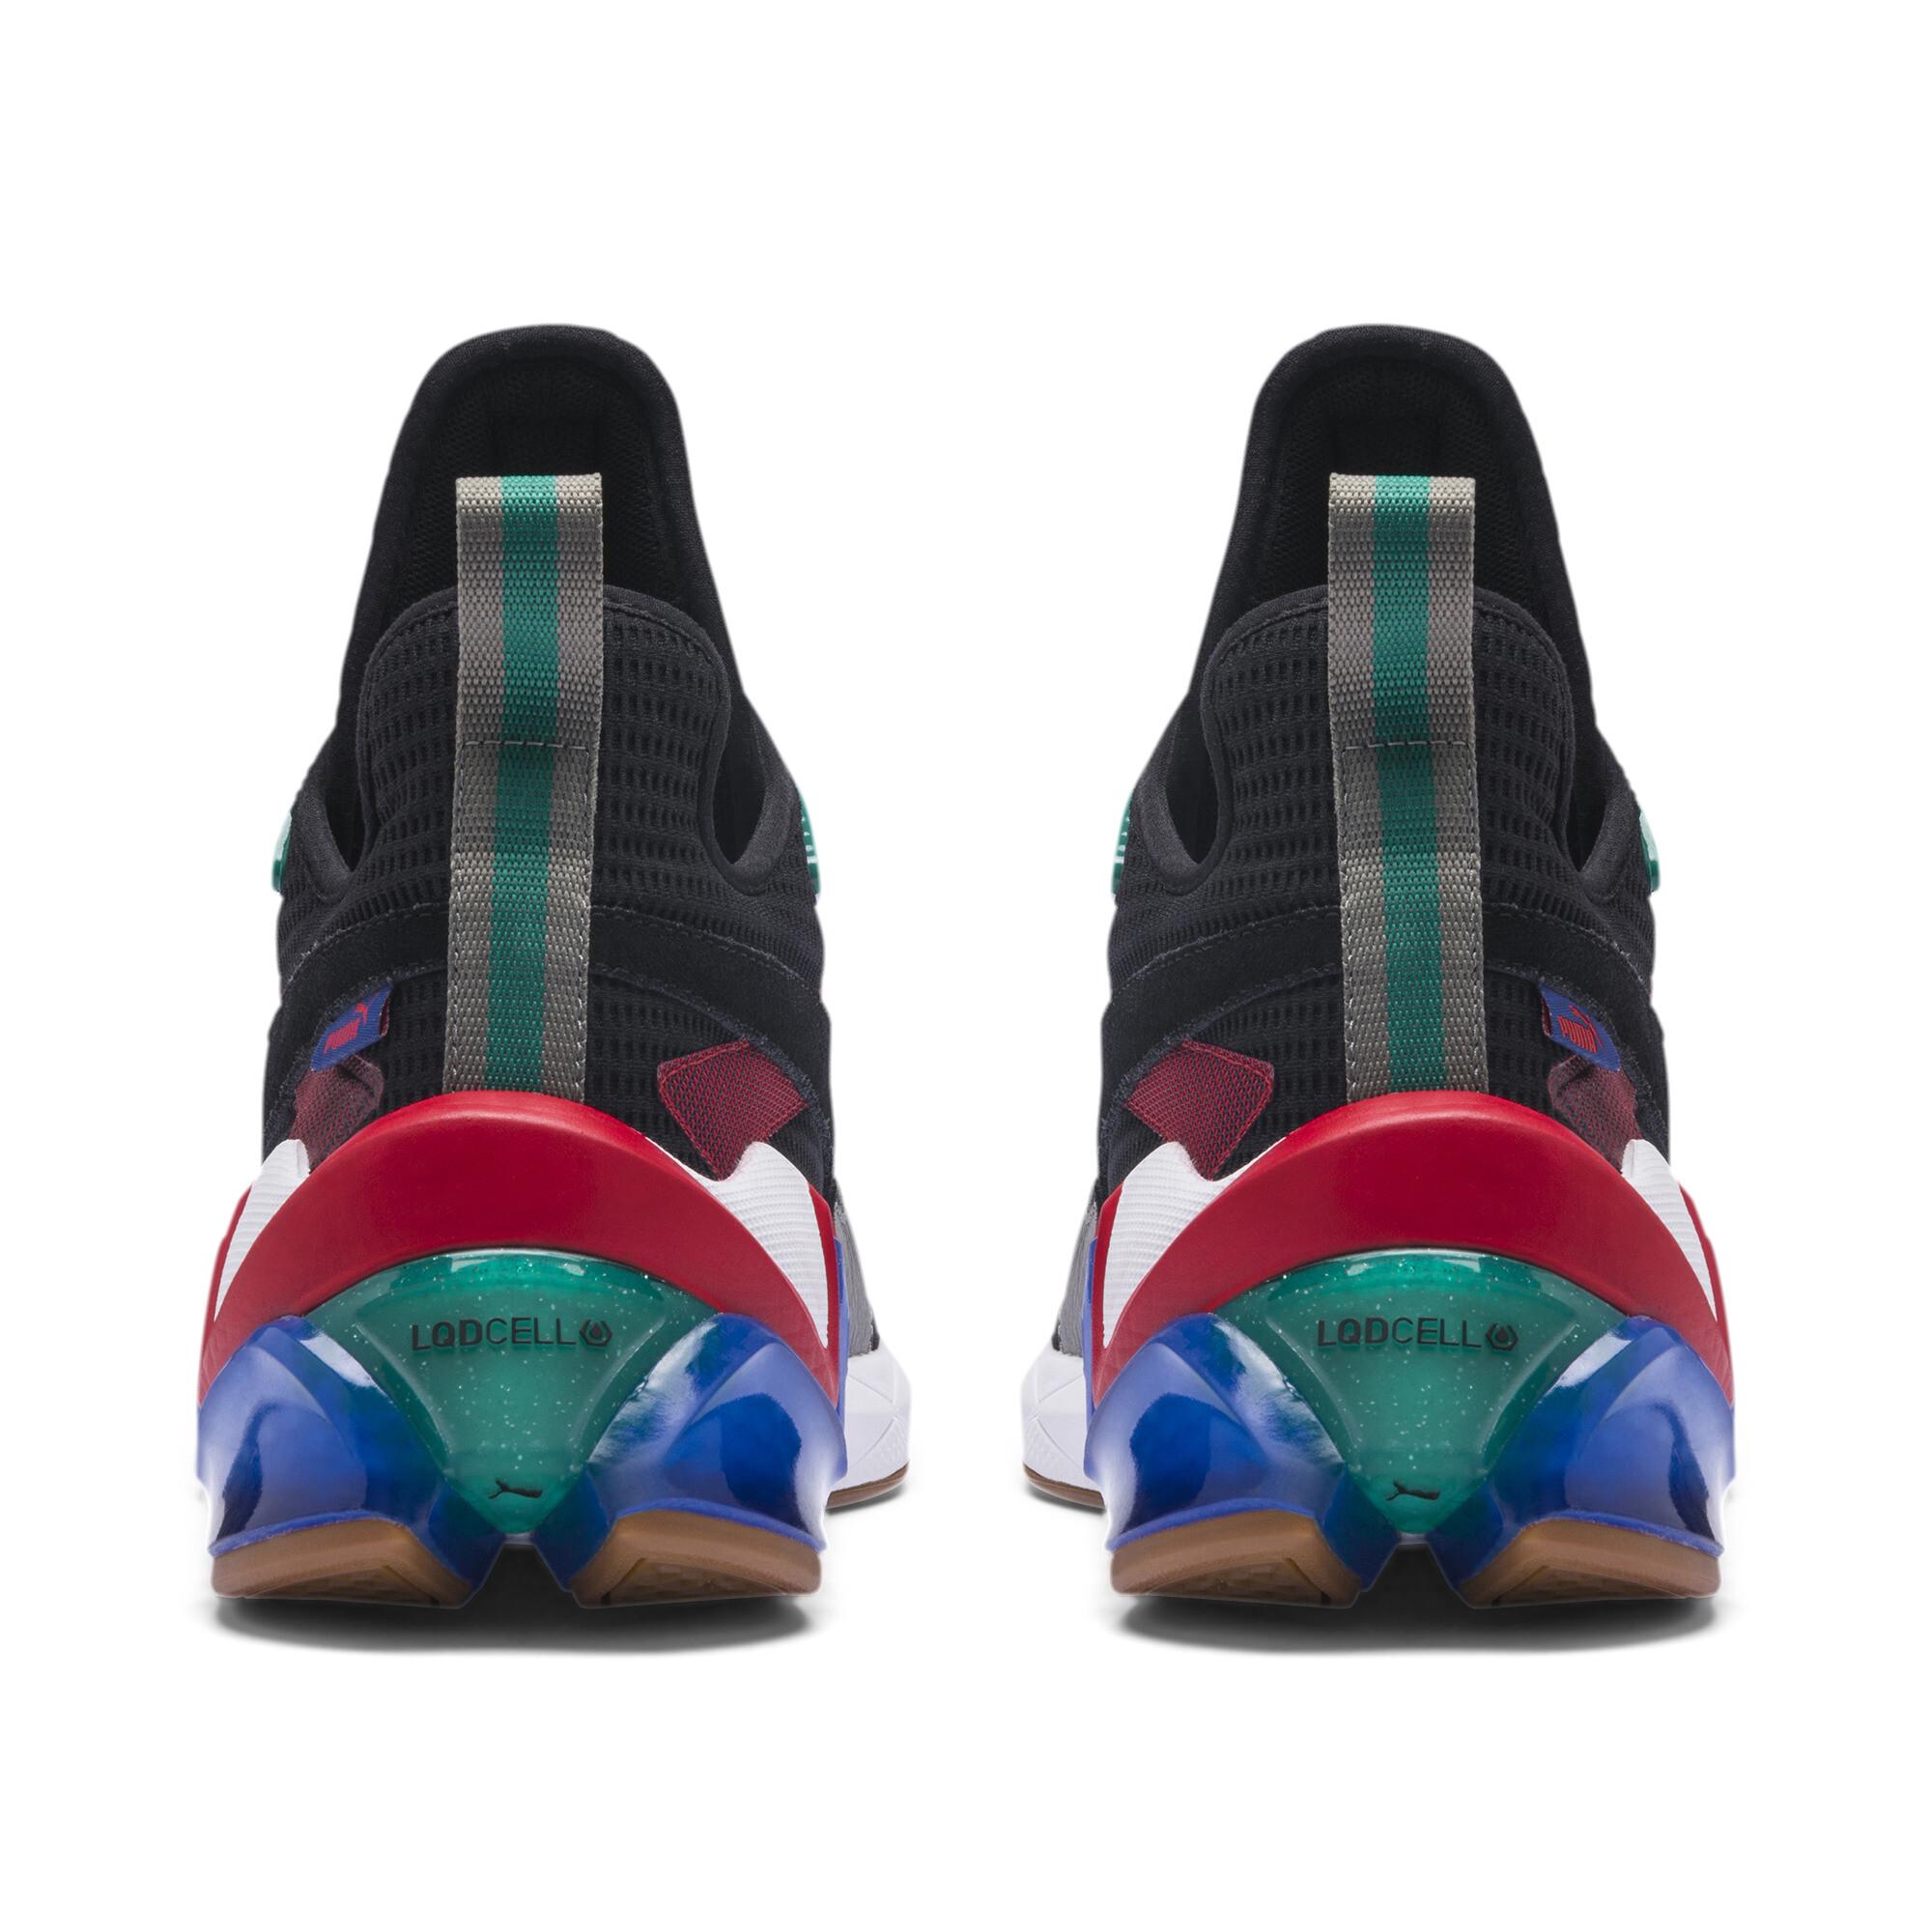 PUMA-Men-039-s-LQDCELL-Origin-Training-Shoes thumbnail 19